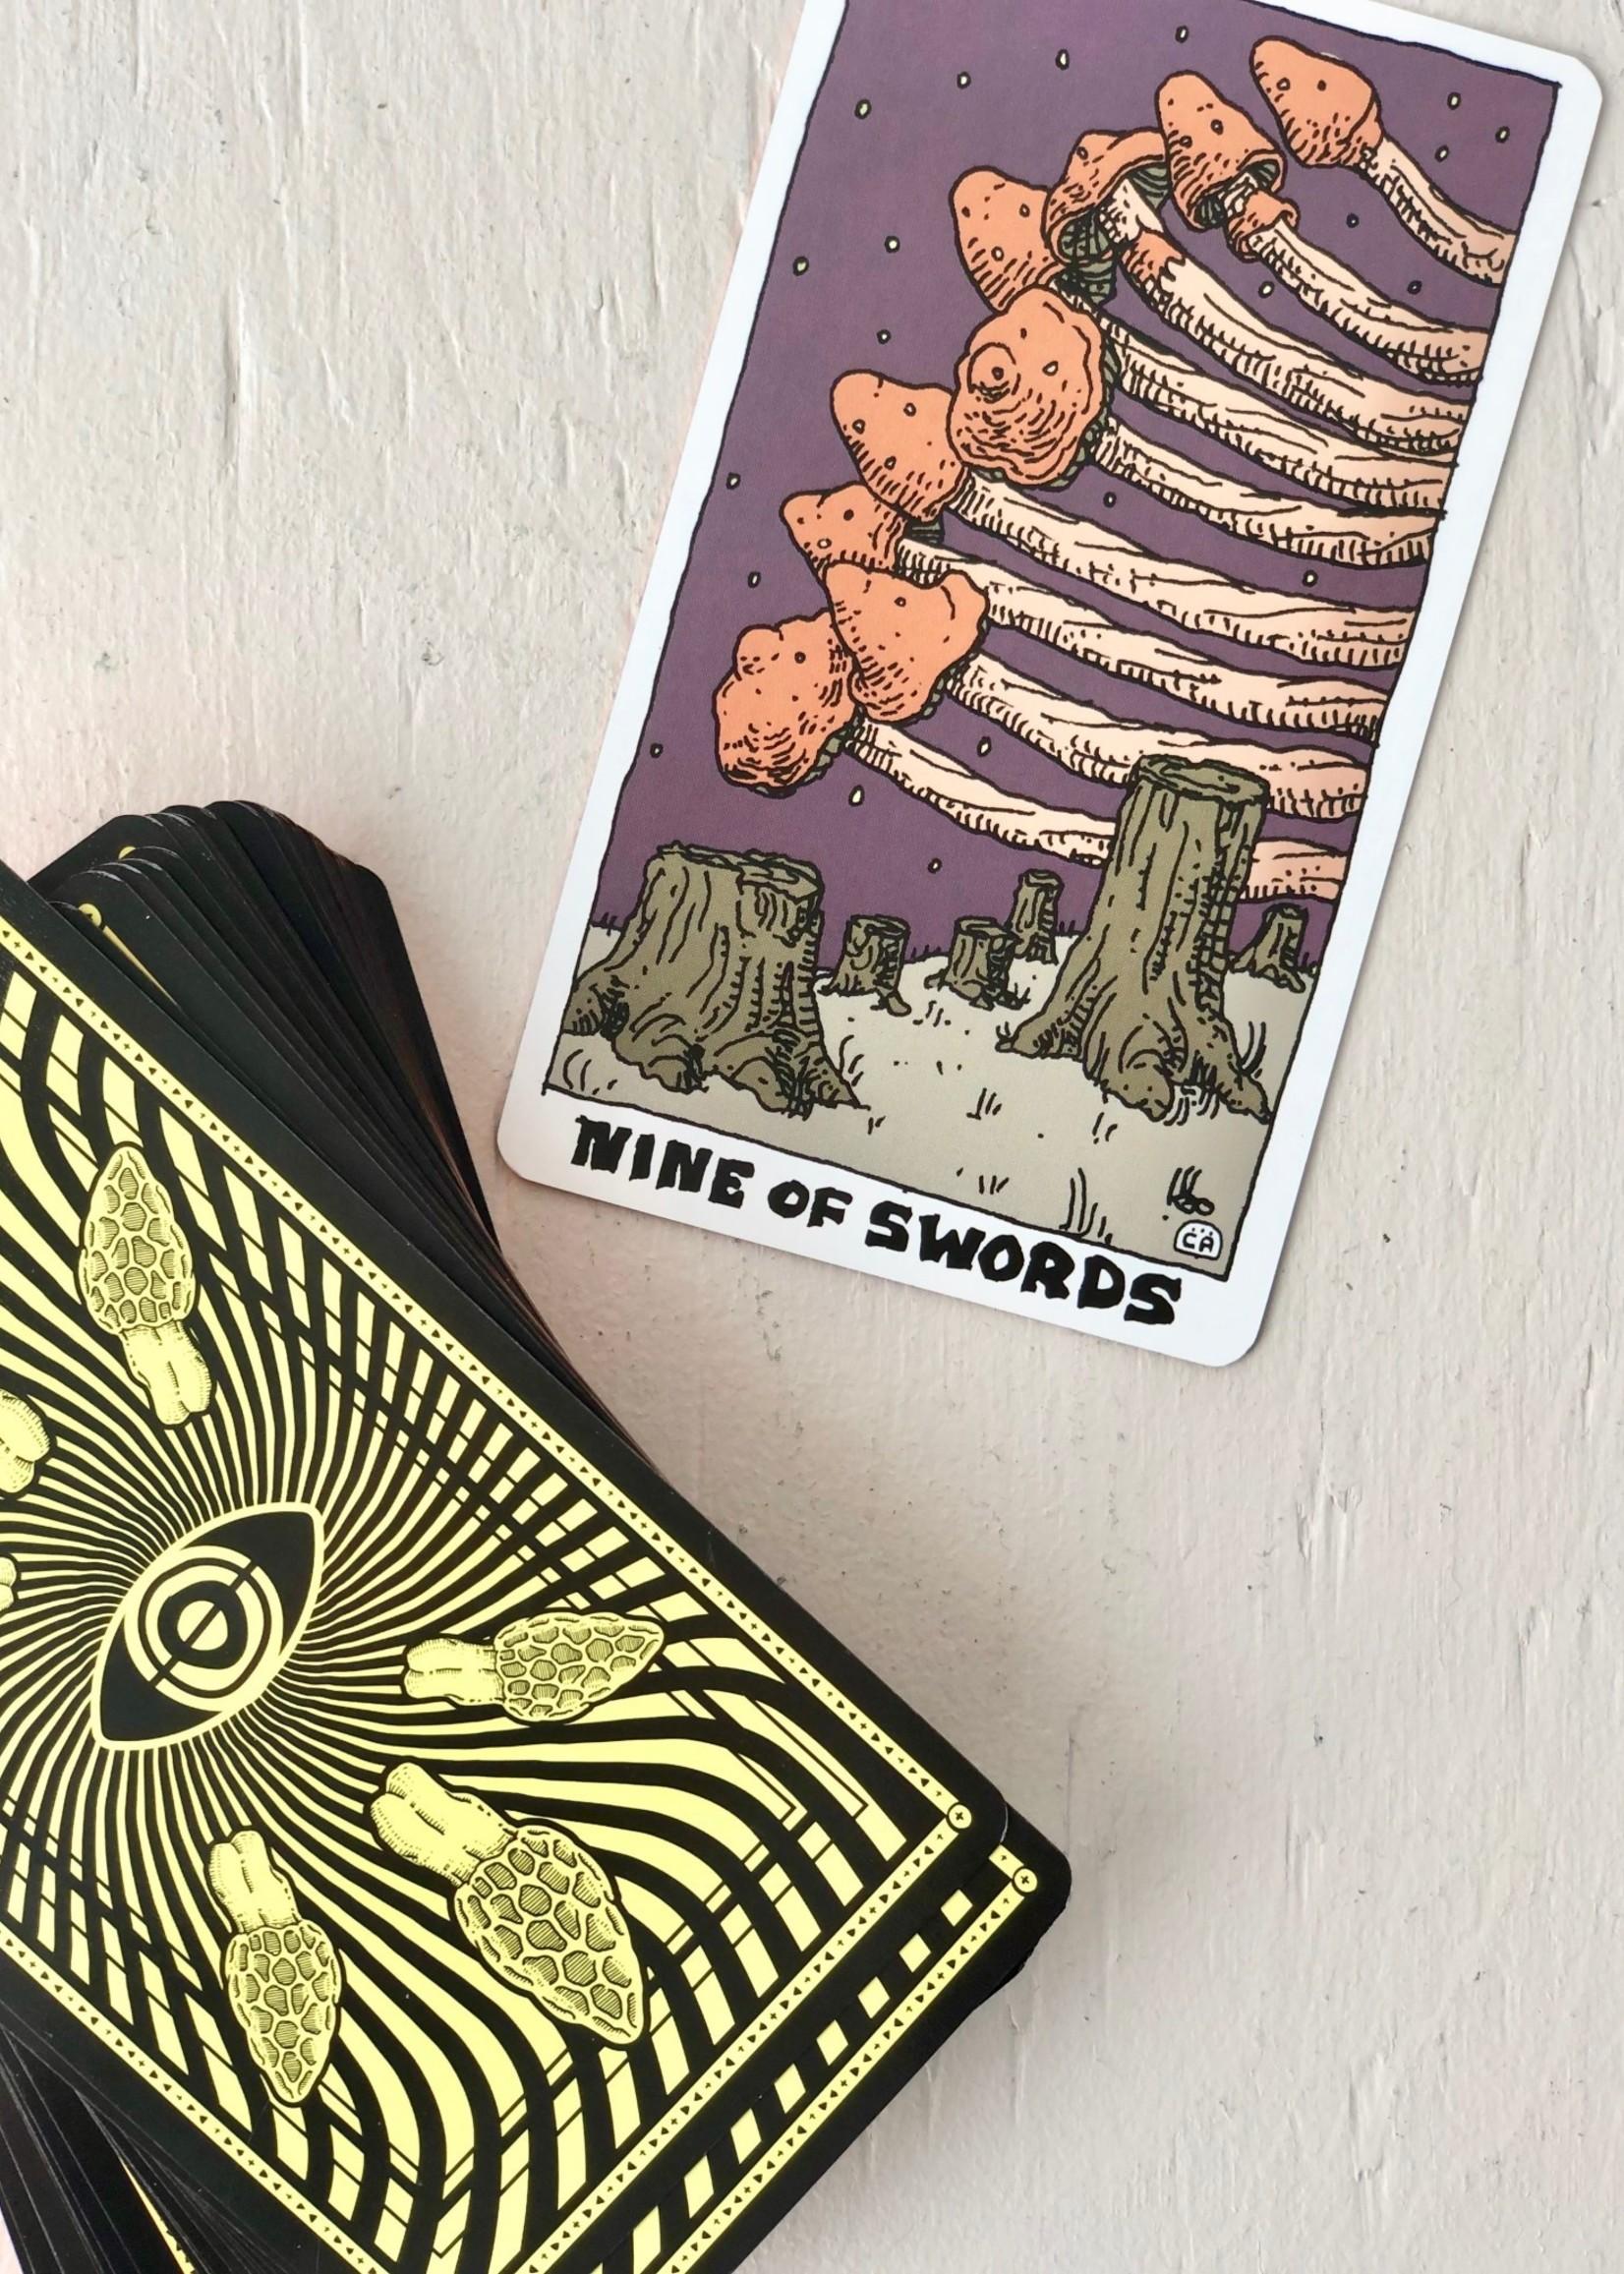 Corvidopolis The Mushroom Deck Tarot Cards